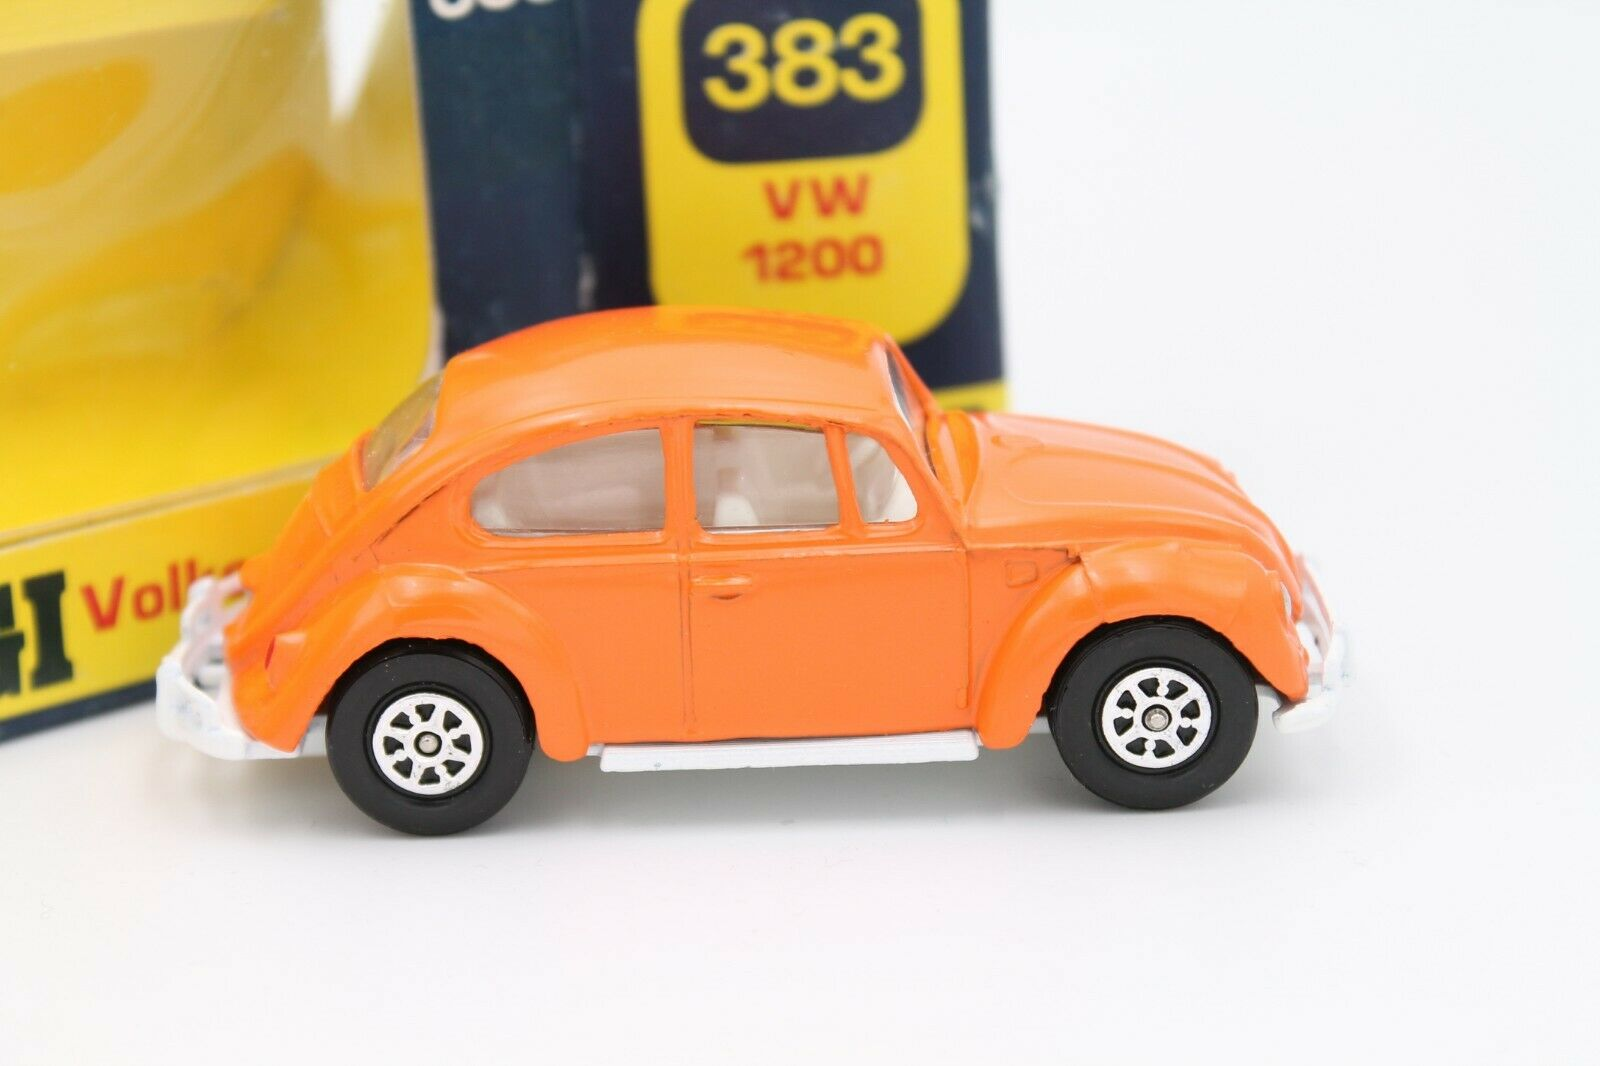 CORGI TOYS  Volkswagen (VW) 1200 MAGGIOLINO  arancia  1 43  OVP  TOP